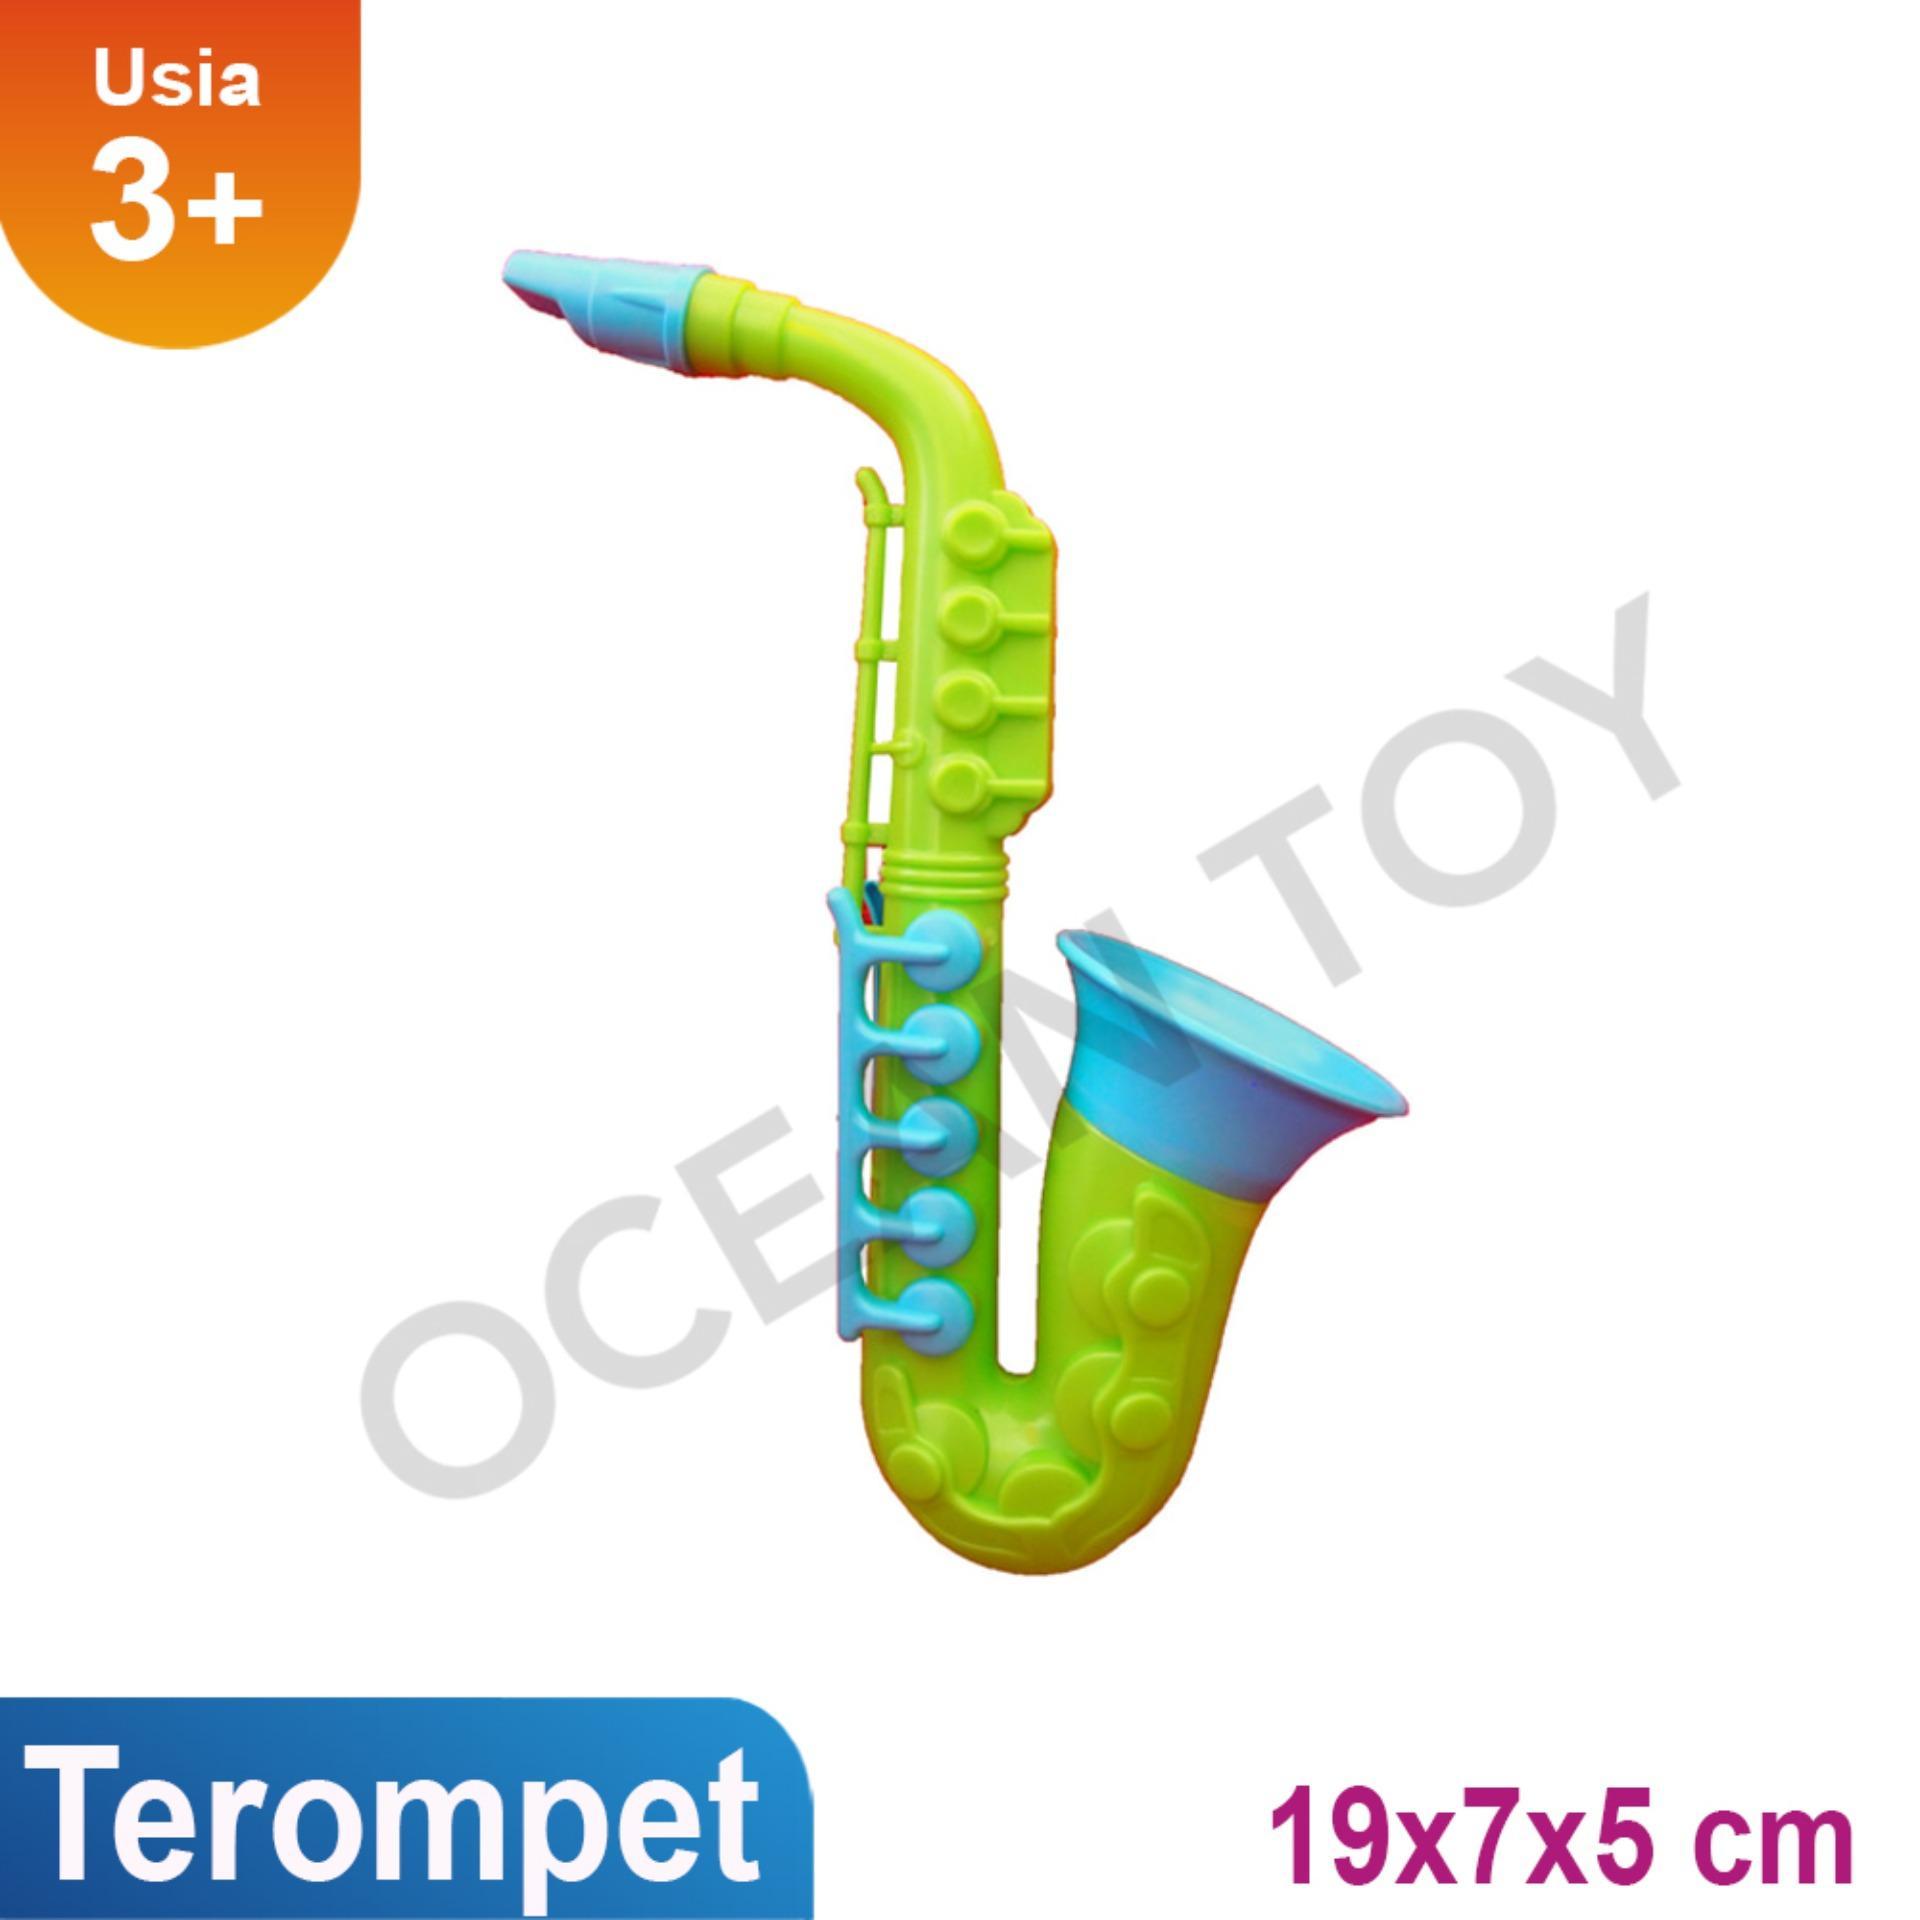 Ocean Toy Terompet Mainan Musik Anak - OCT3210 - Multicolor